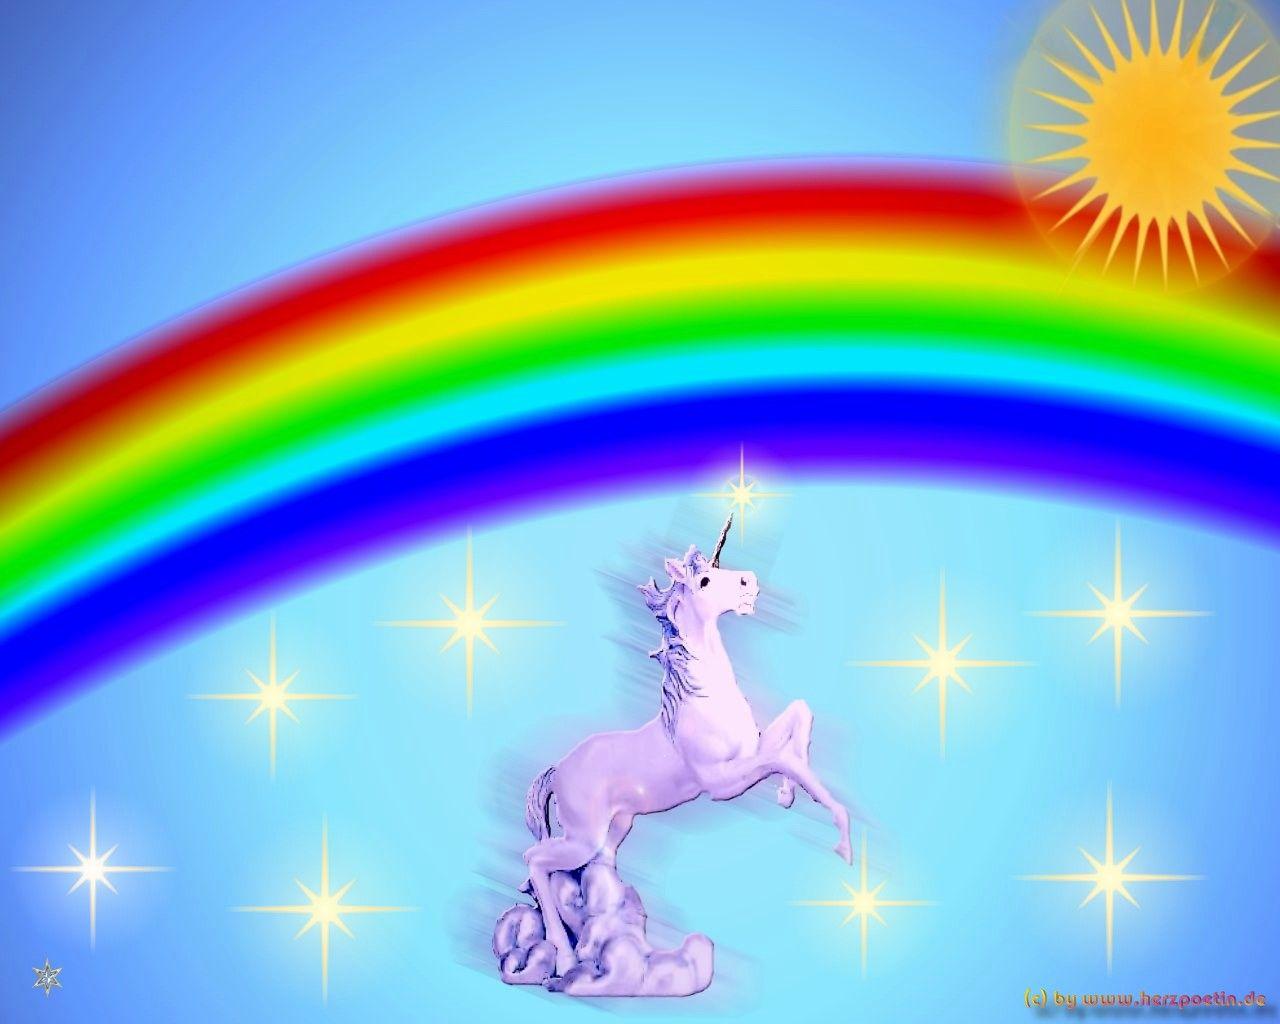 Rainbows and Unicorns on Pinterest | Unicorns, Rainbows and ...